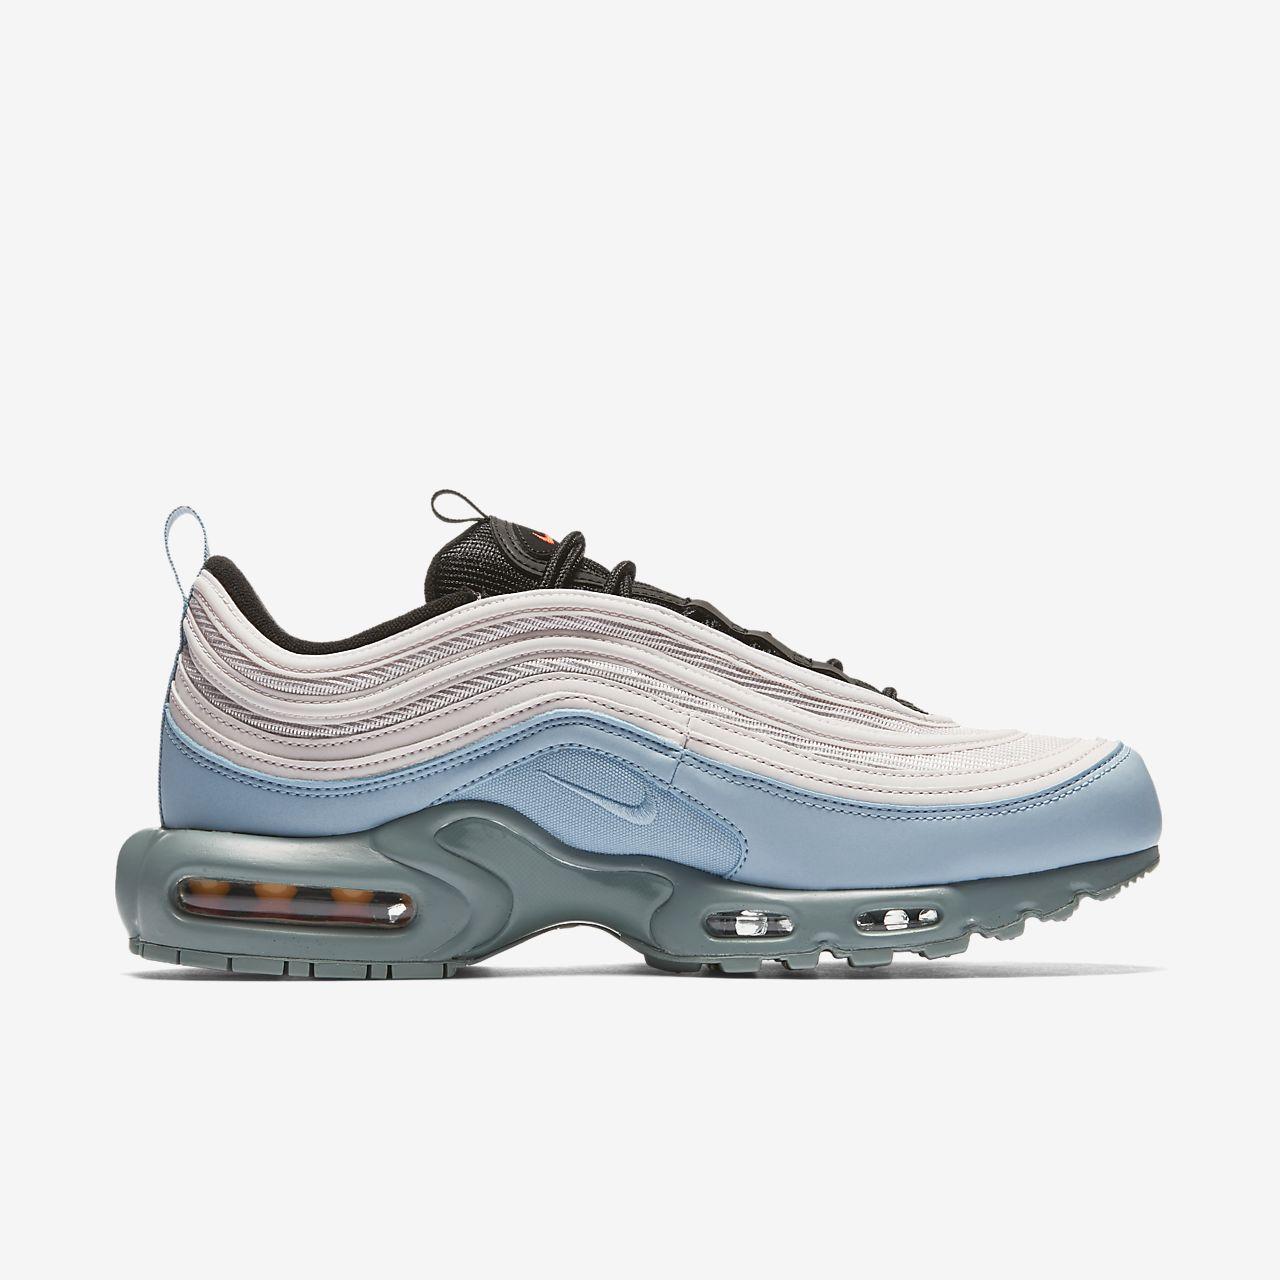 cheaper fa830 de237 ... tn ultra shoes black khaki camouflagepopular  nike air max plus 97 mens  shoe